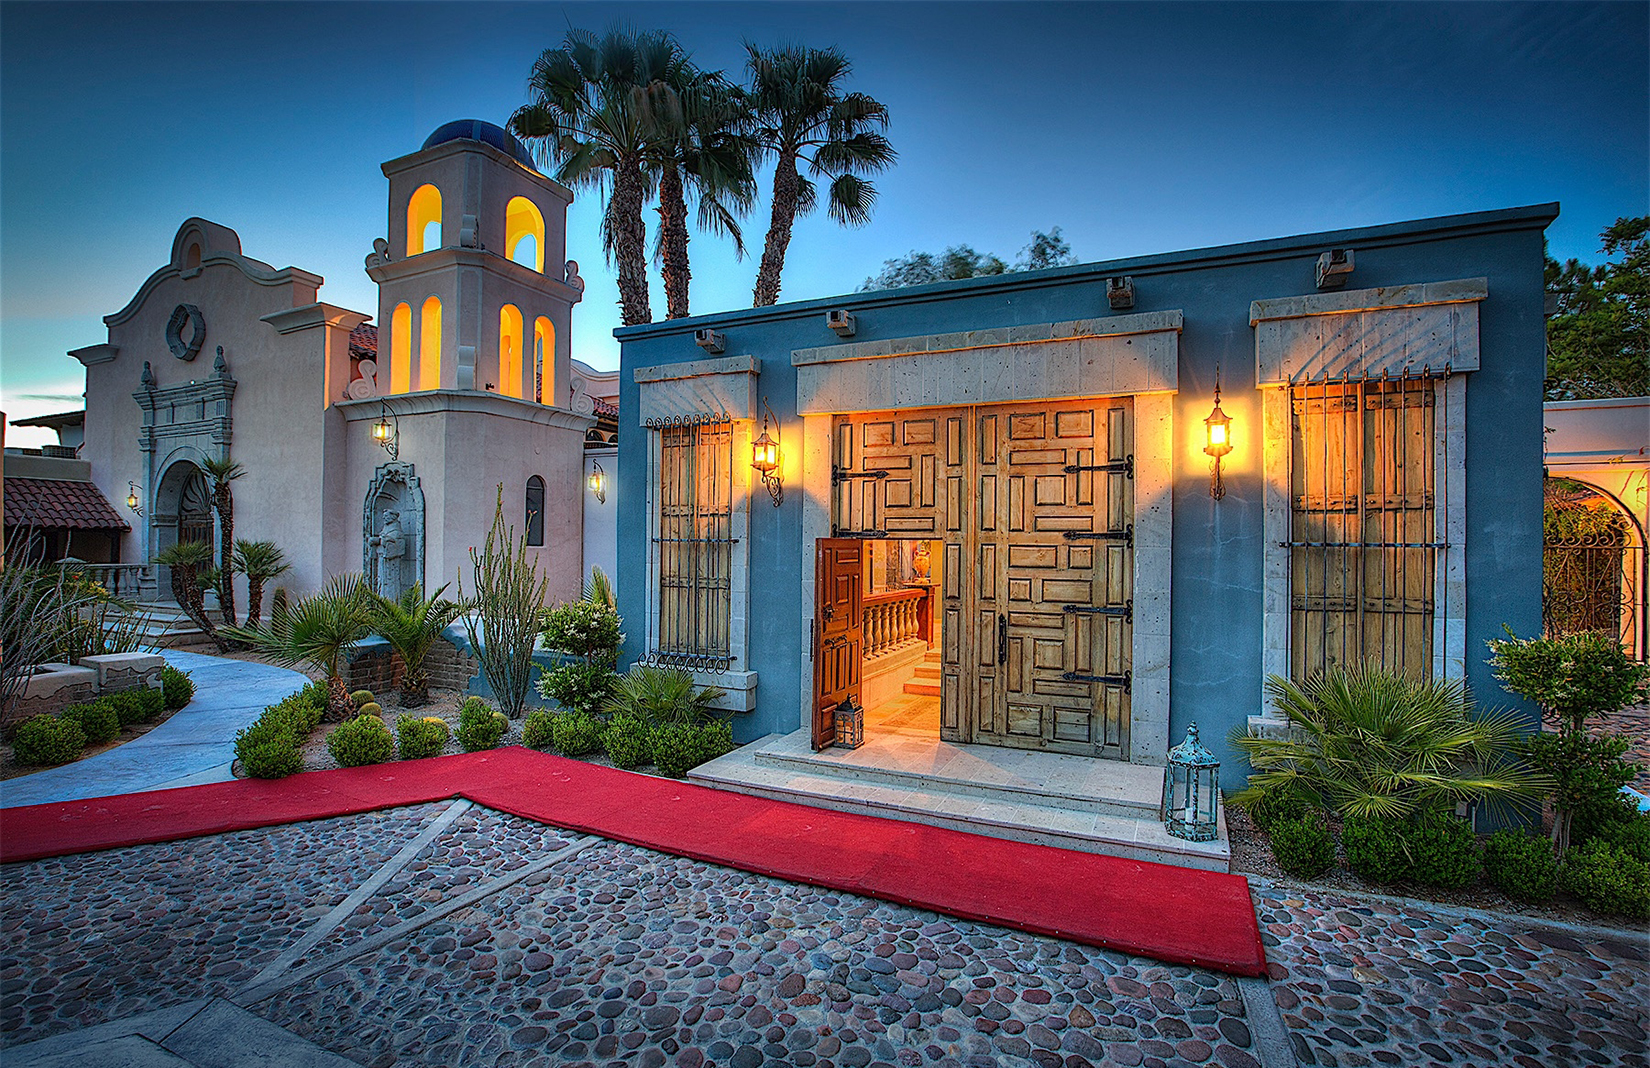 Michael Jackson's Thriller Villa in Las Vegas